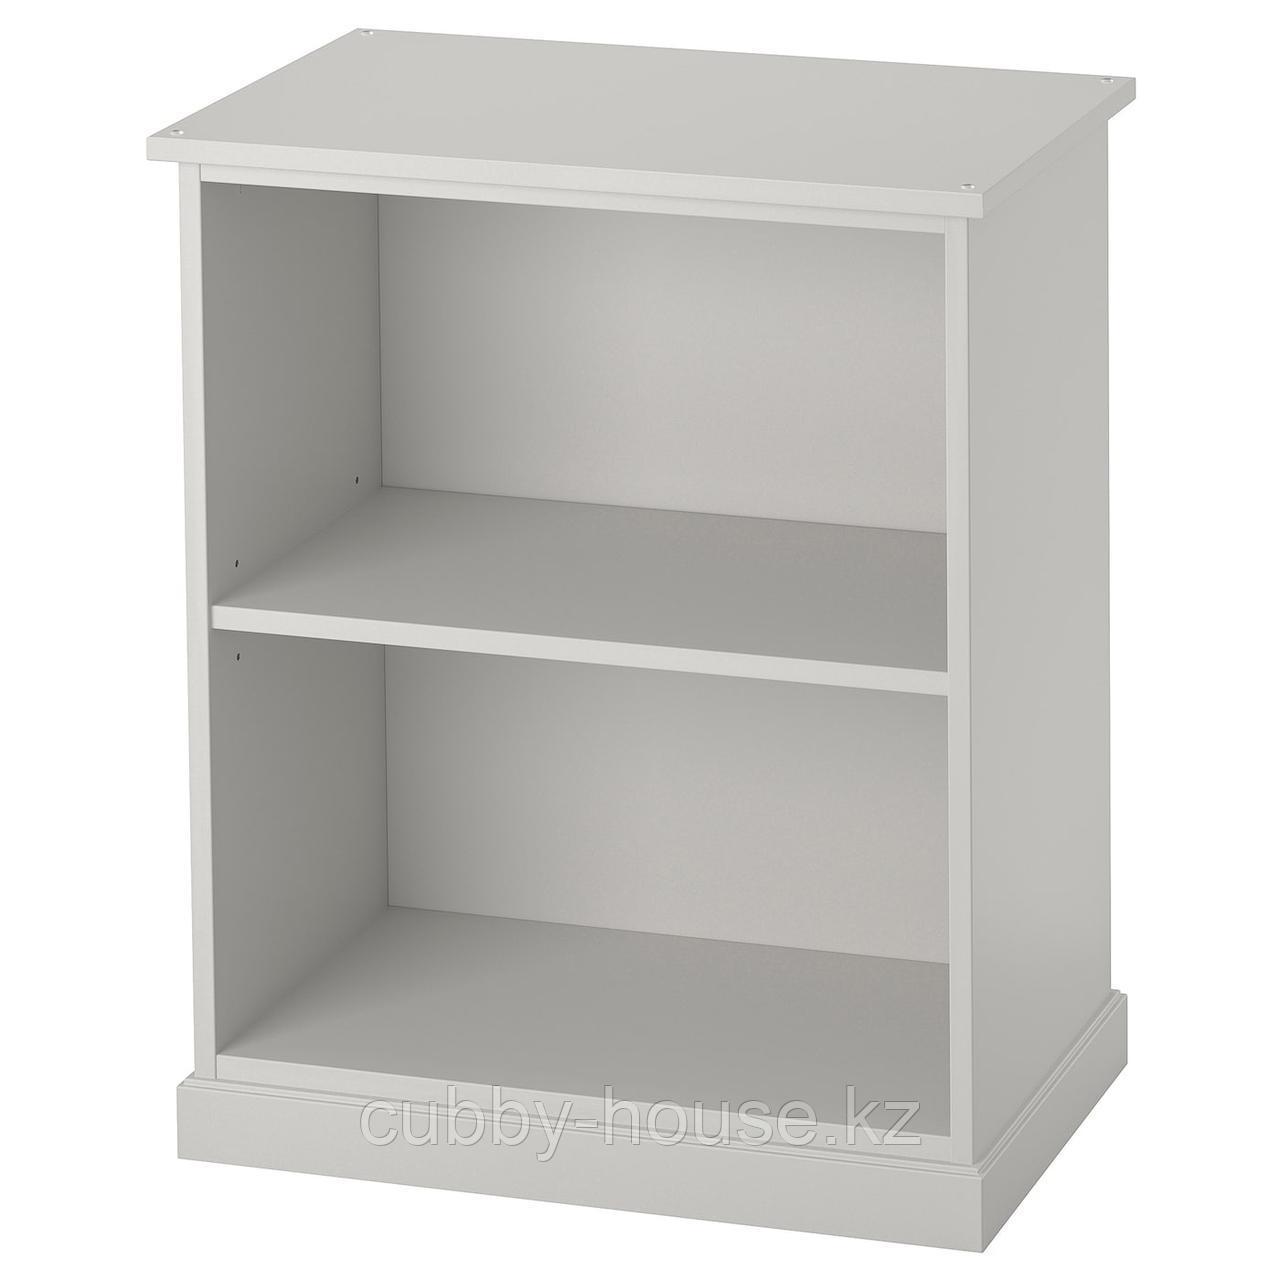 КЛИМПЕН Опора-модуль для хранения, светло-серый серый, 58x70 см